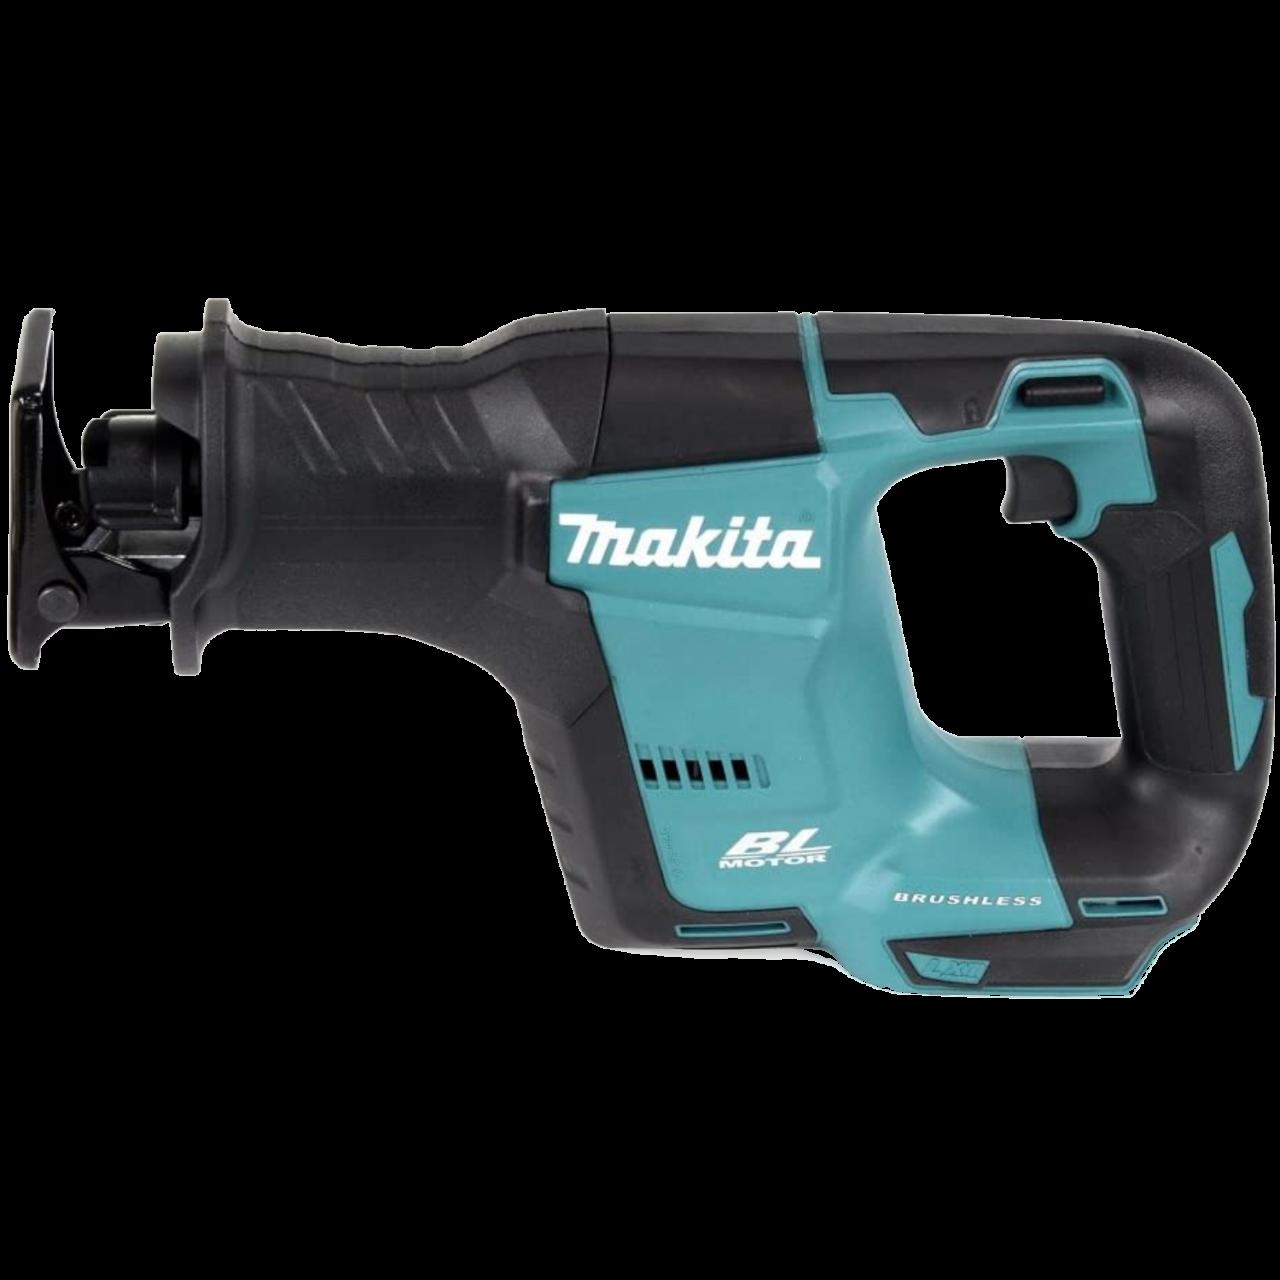 Makita DJR188ZJ Akku-Reciprosäge im MAKPAC Gr. 2 inkl. Einlage, 18V, 0-3.000 min-1, 20 mm